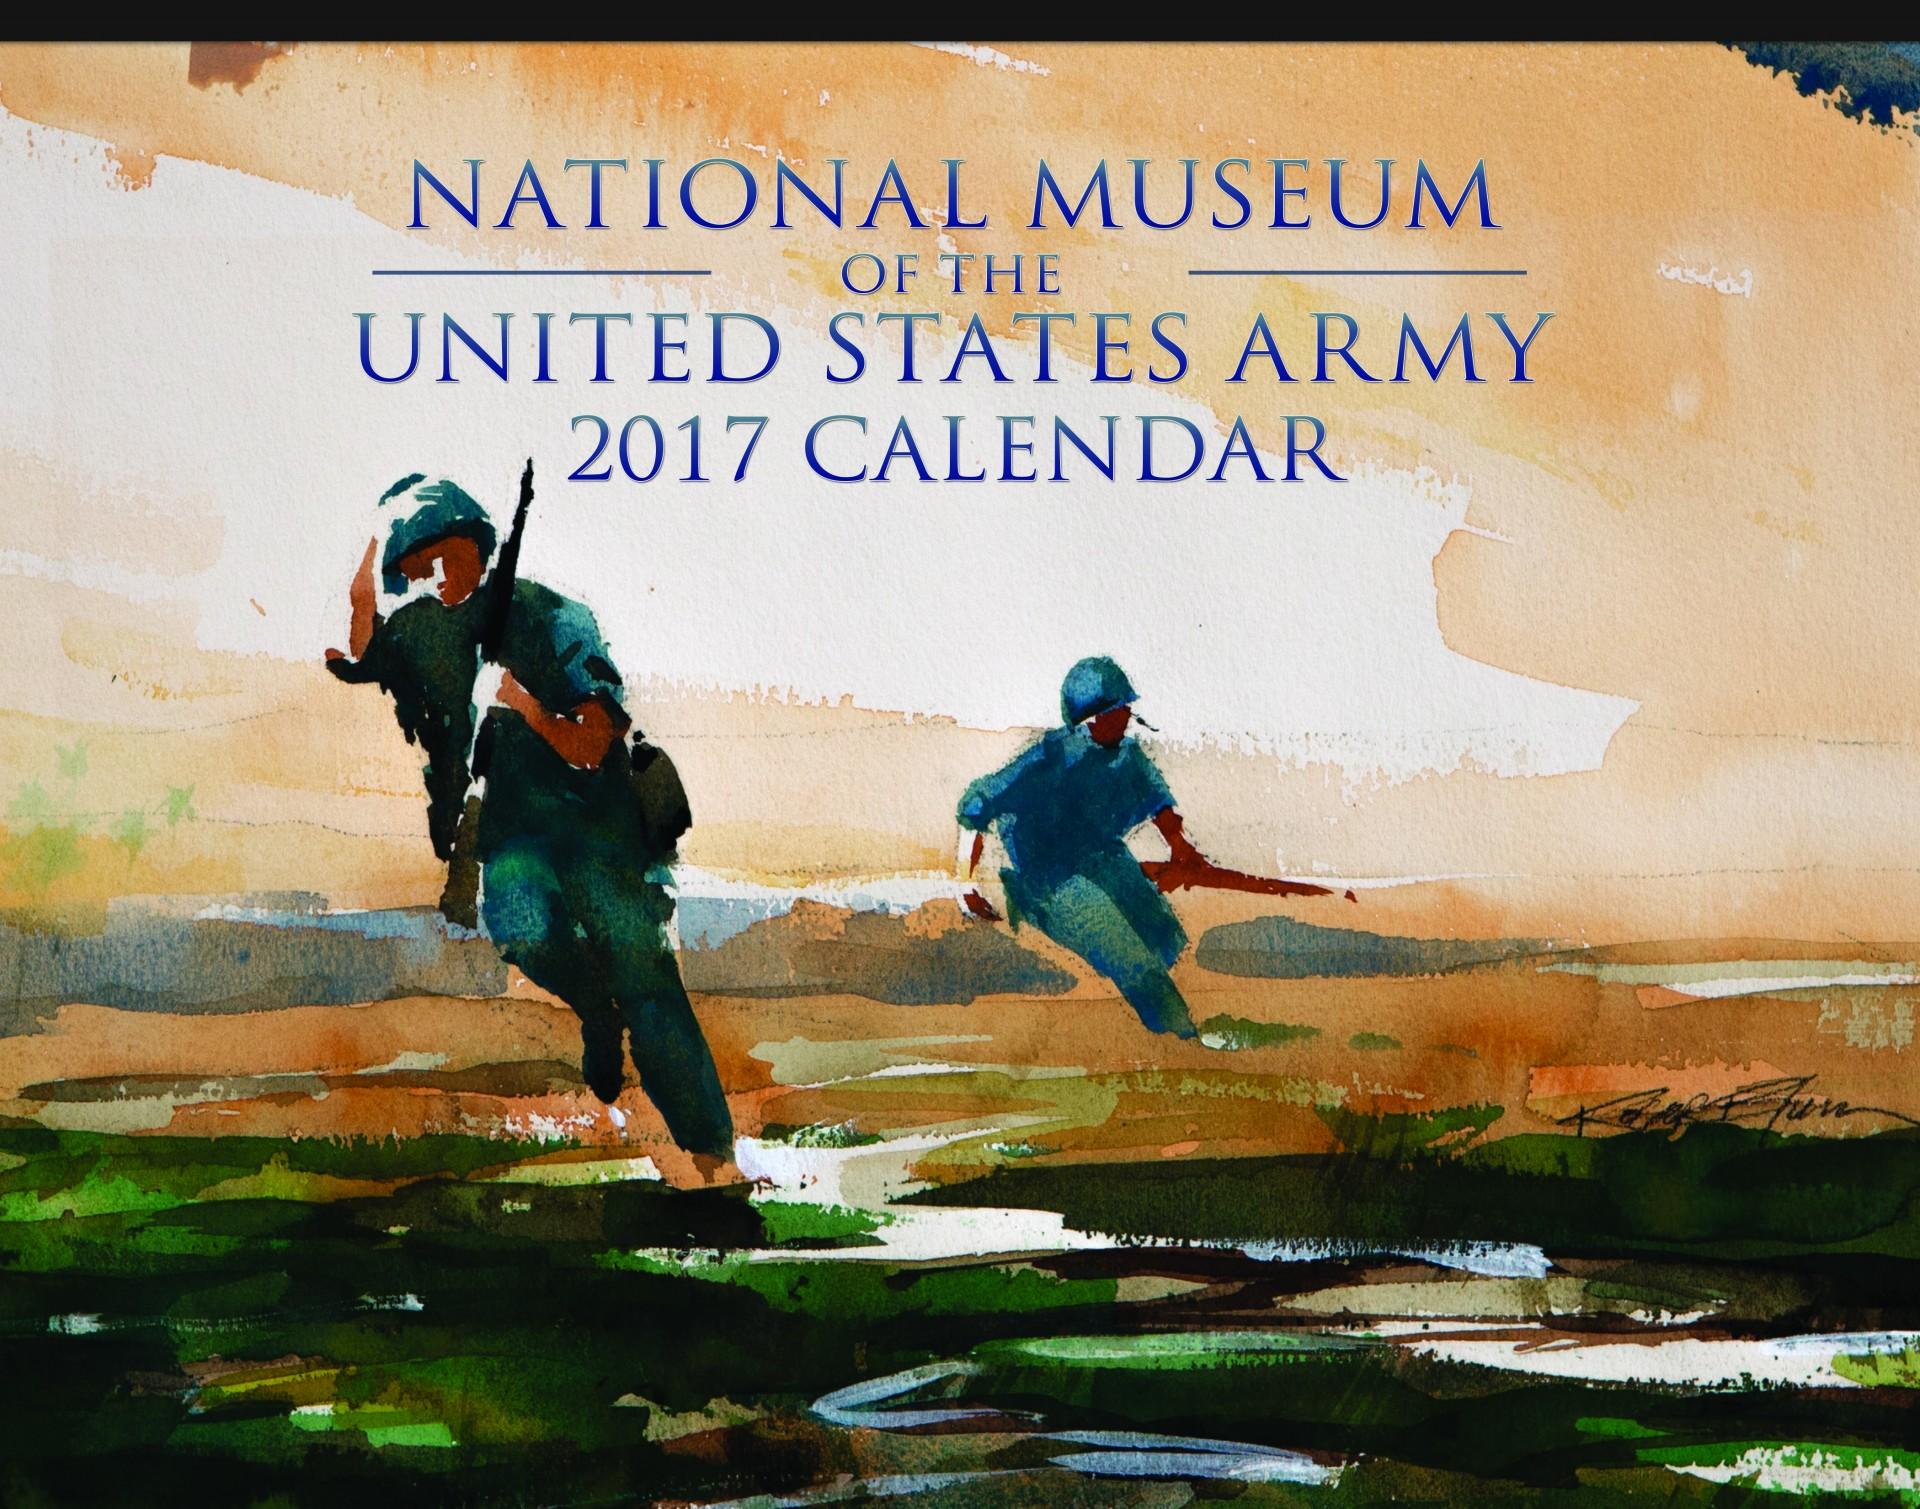 2017-calendar-front-cover-final